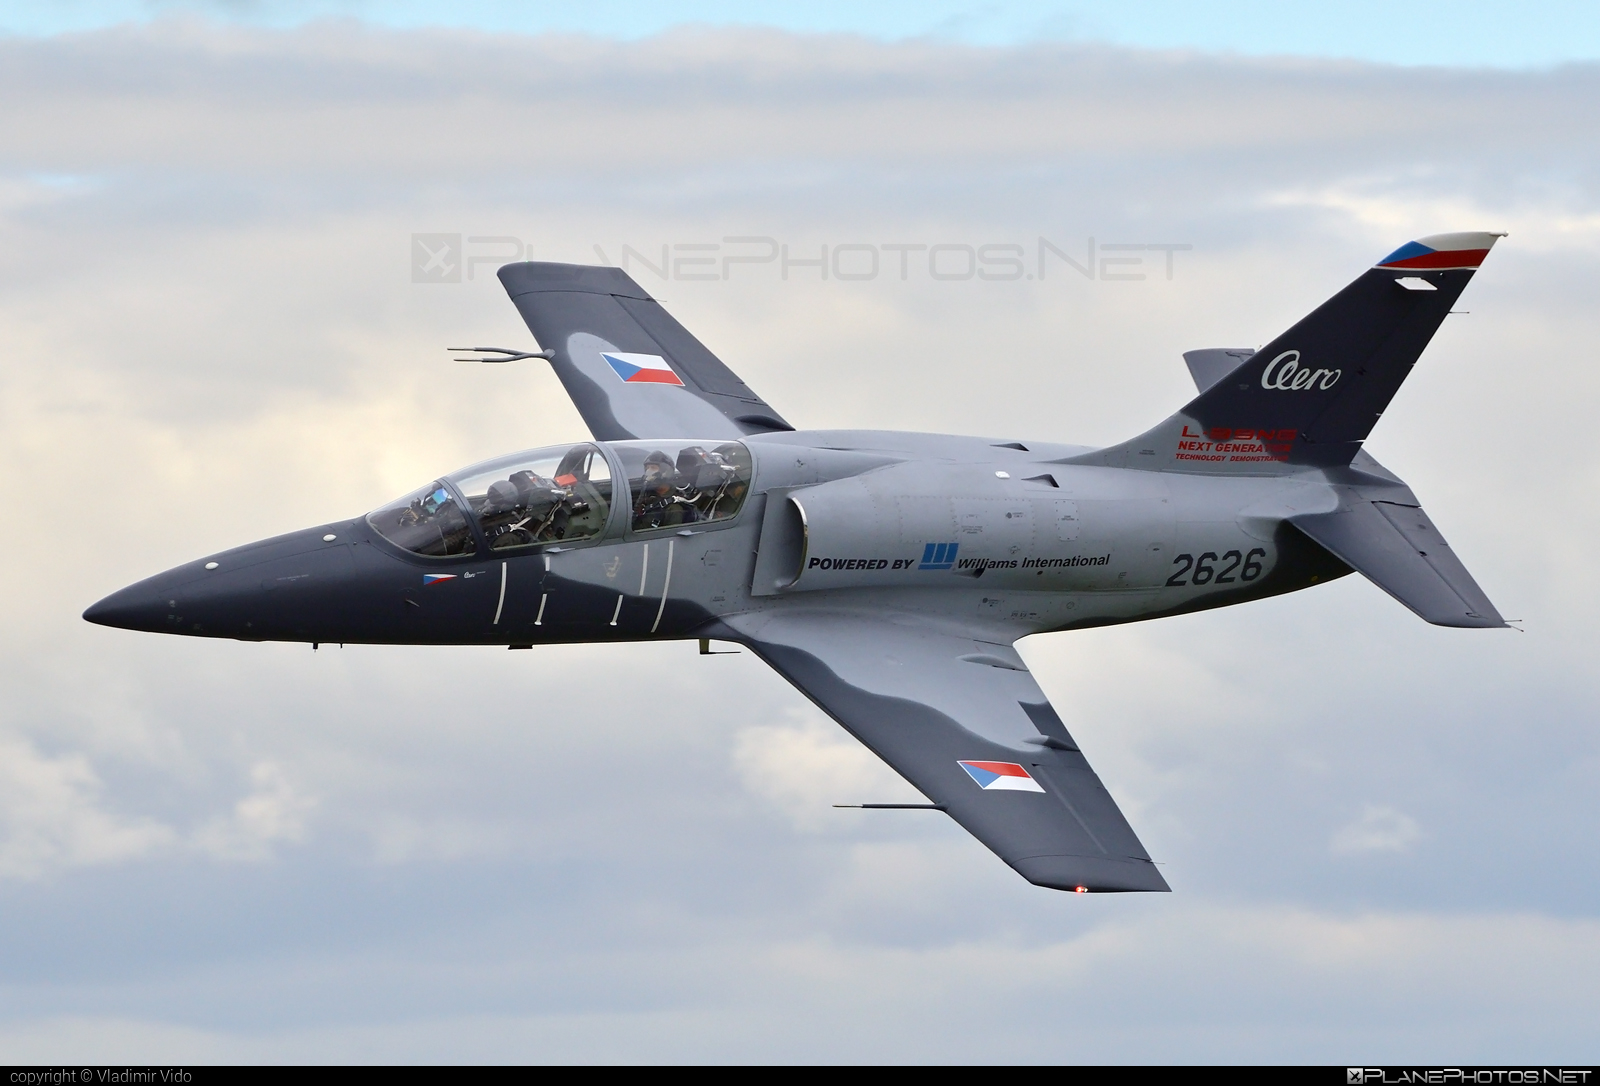 Aero L-39CW Albatros - 2626 operated by Aero Vodochody #aero #aerol39 #aerol39albatros #aerol39cwalbatros #aerovodochody #albatros #l39 #l39cw #l39cwalbatros